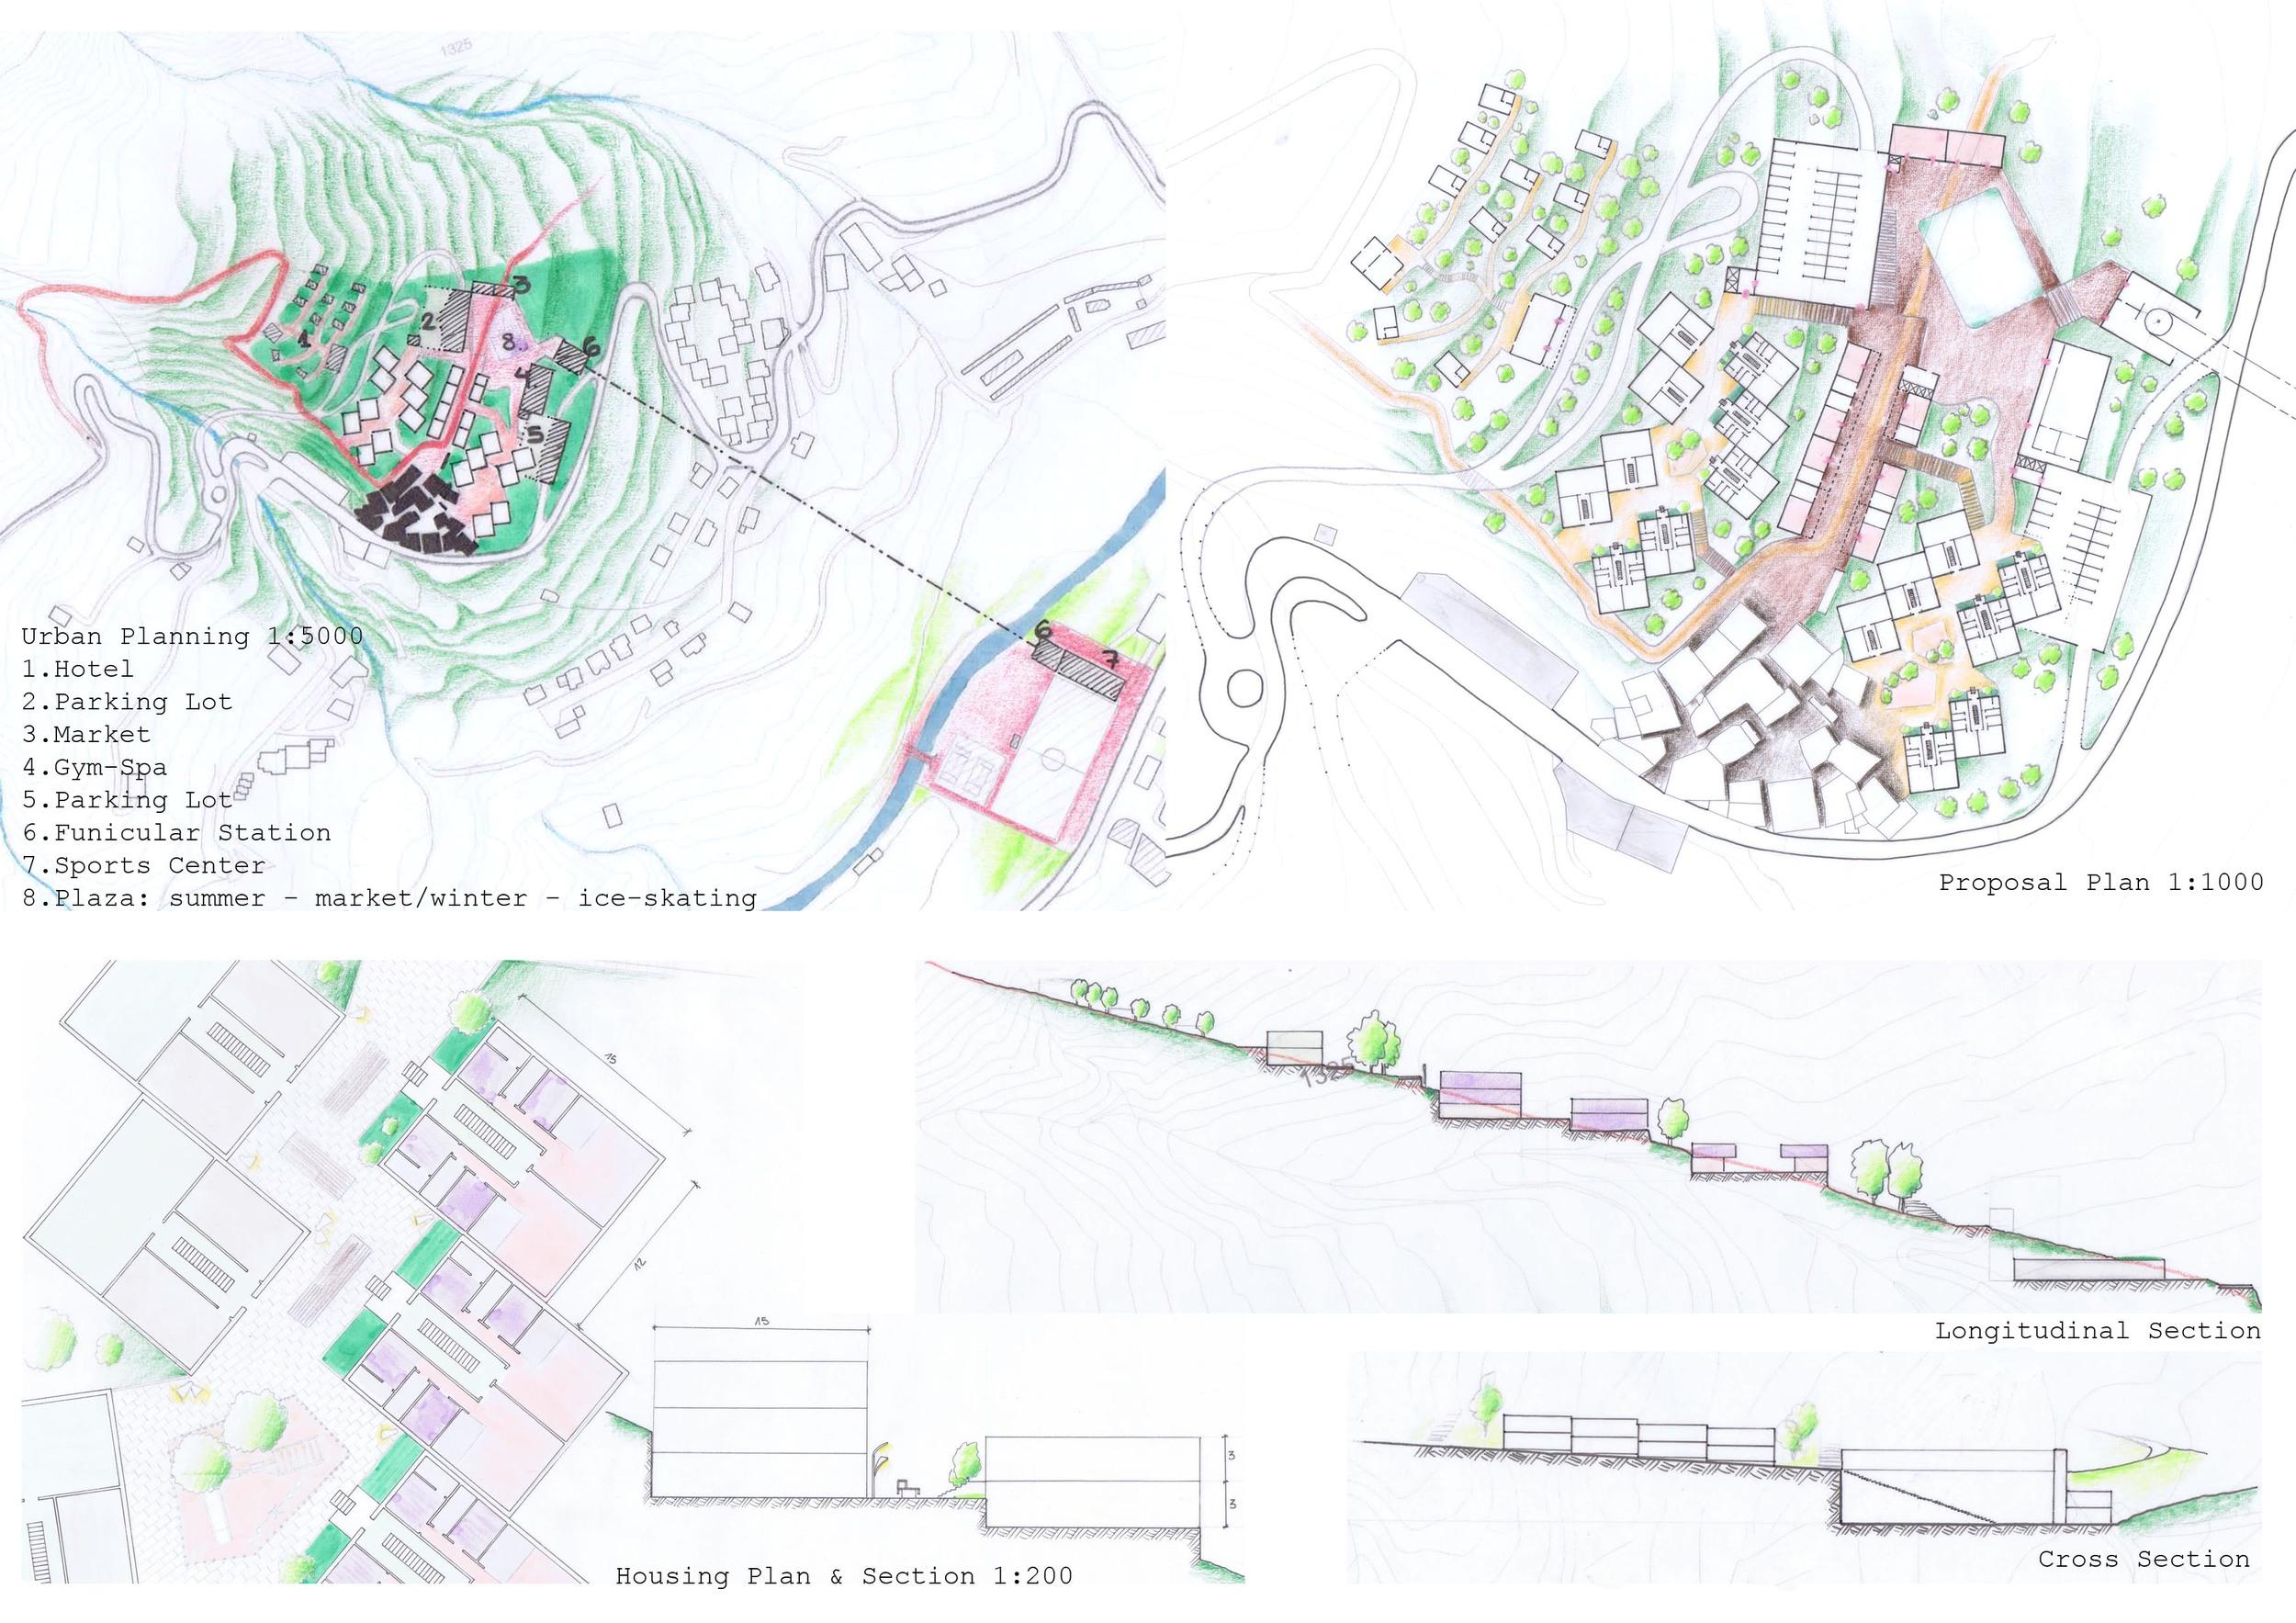 Encamp (Andorra) Urban Planning